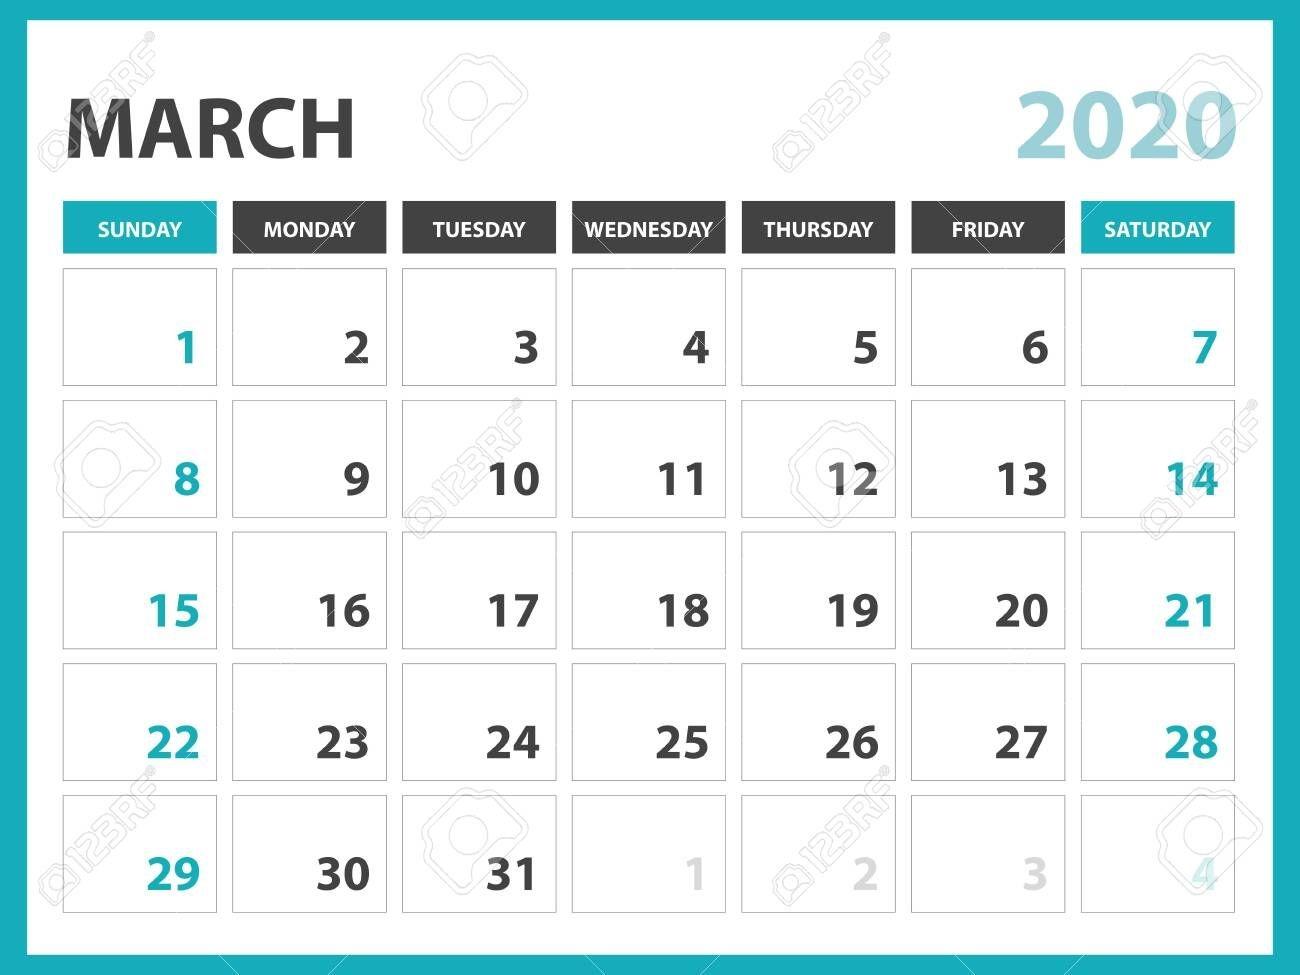 desk calendar layout size 8 x 6 inch, march 2020 calendar template,